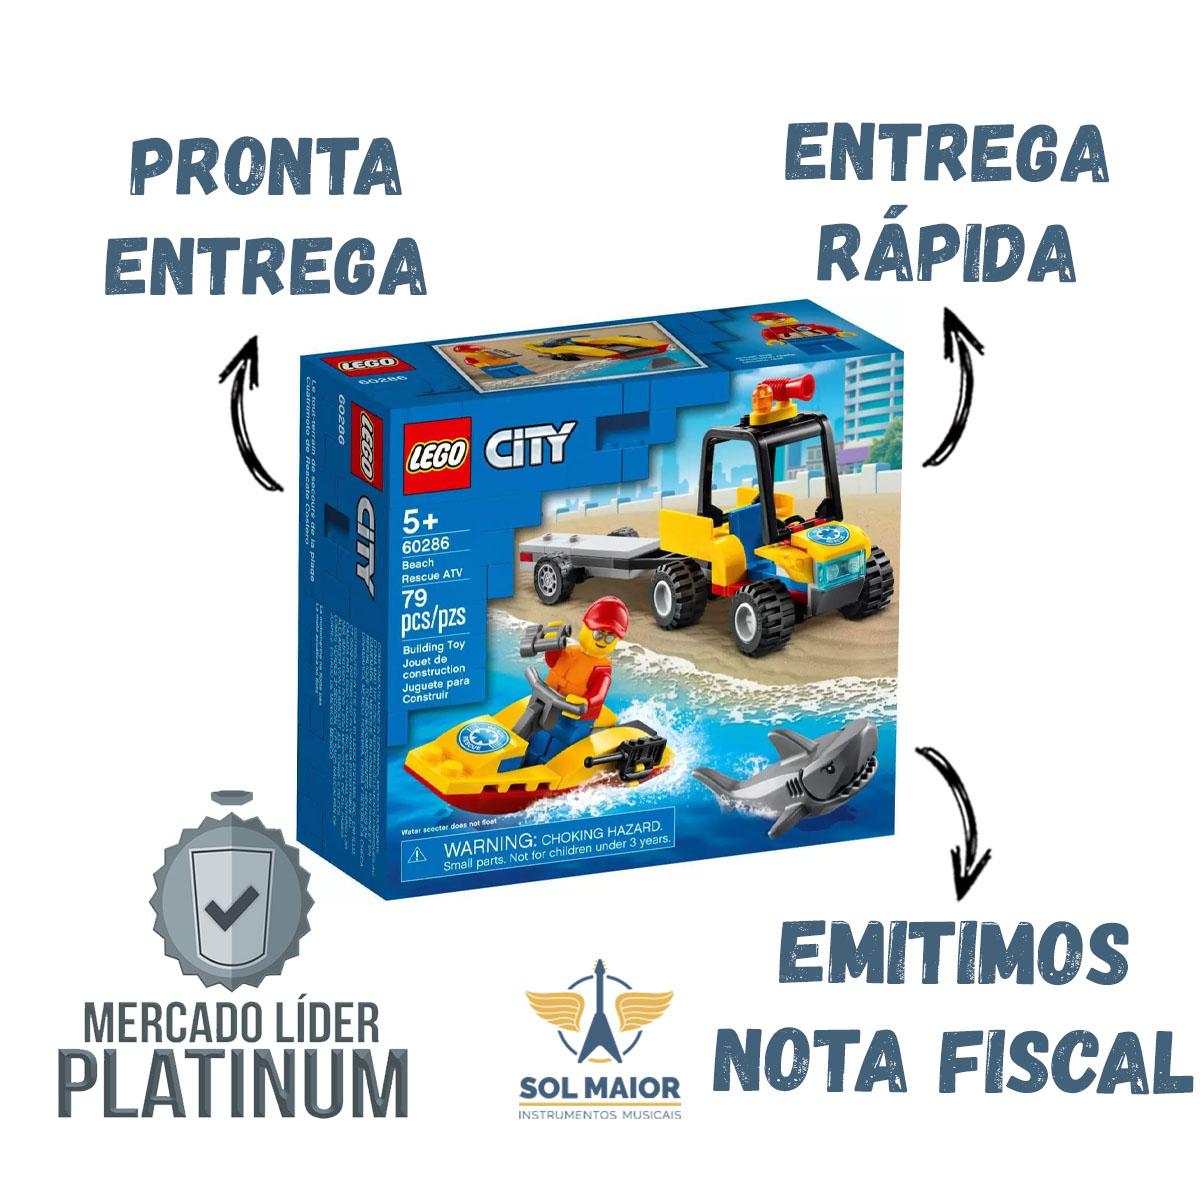 Lego City 60286 - Carro Off Road De Resgate Na Praia 79 Pçs